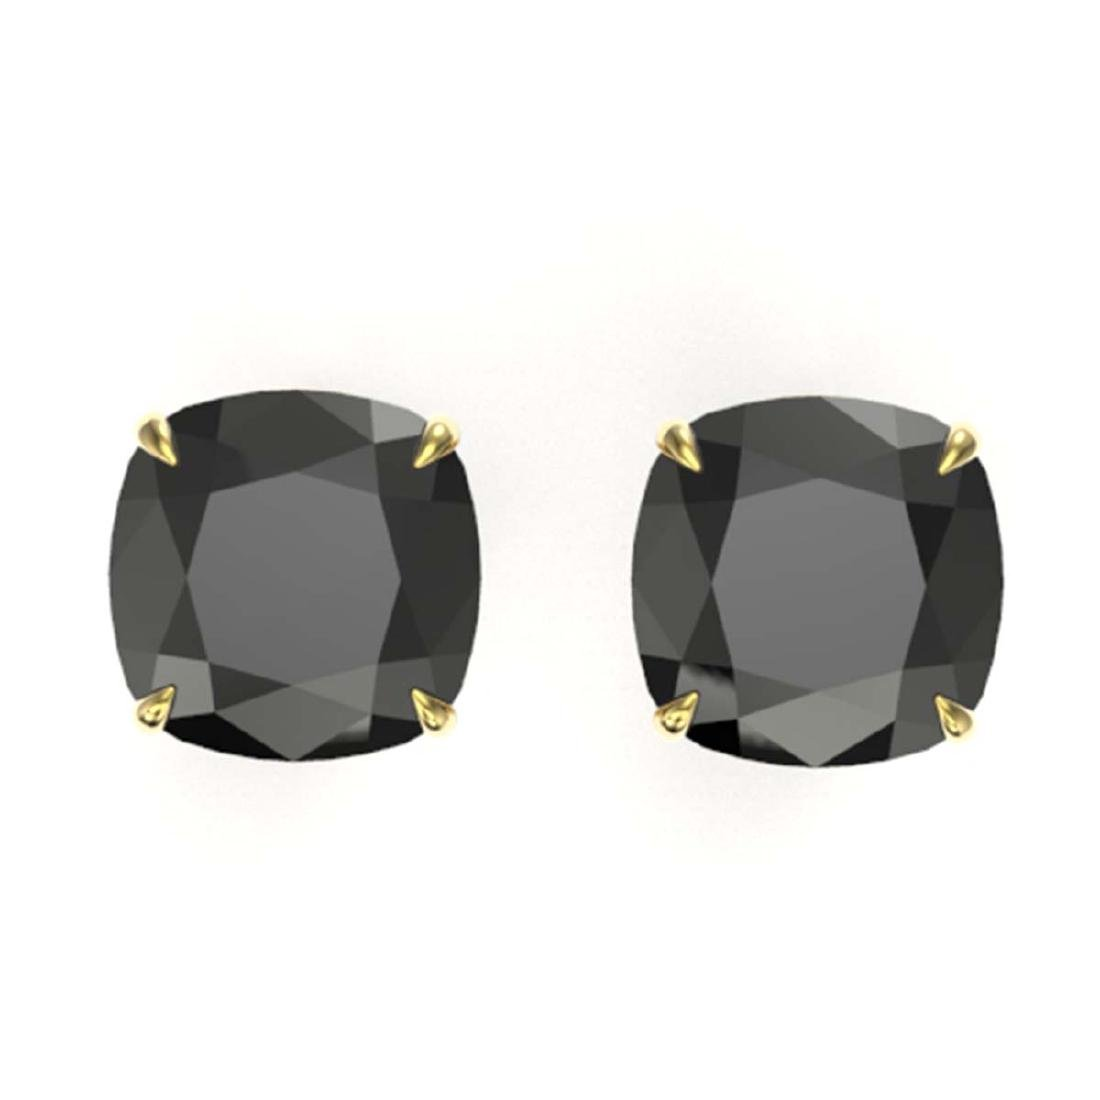 12 CTW Cushion Cut Black VS/SI Diamond Stud Earrings